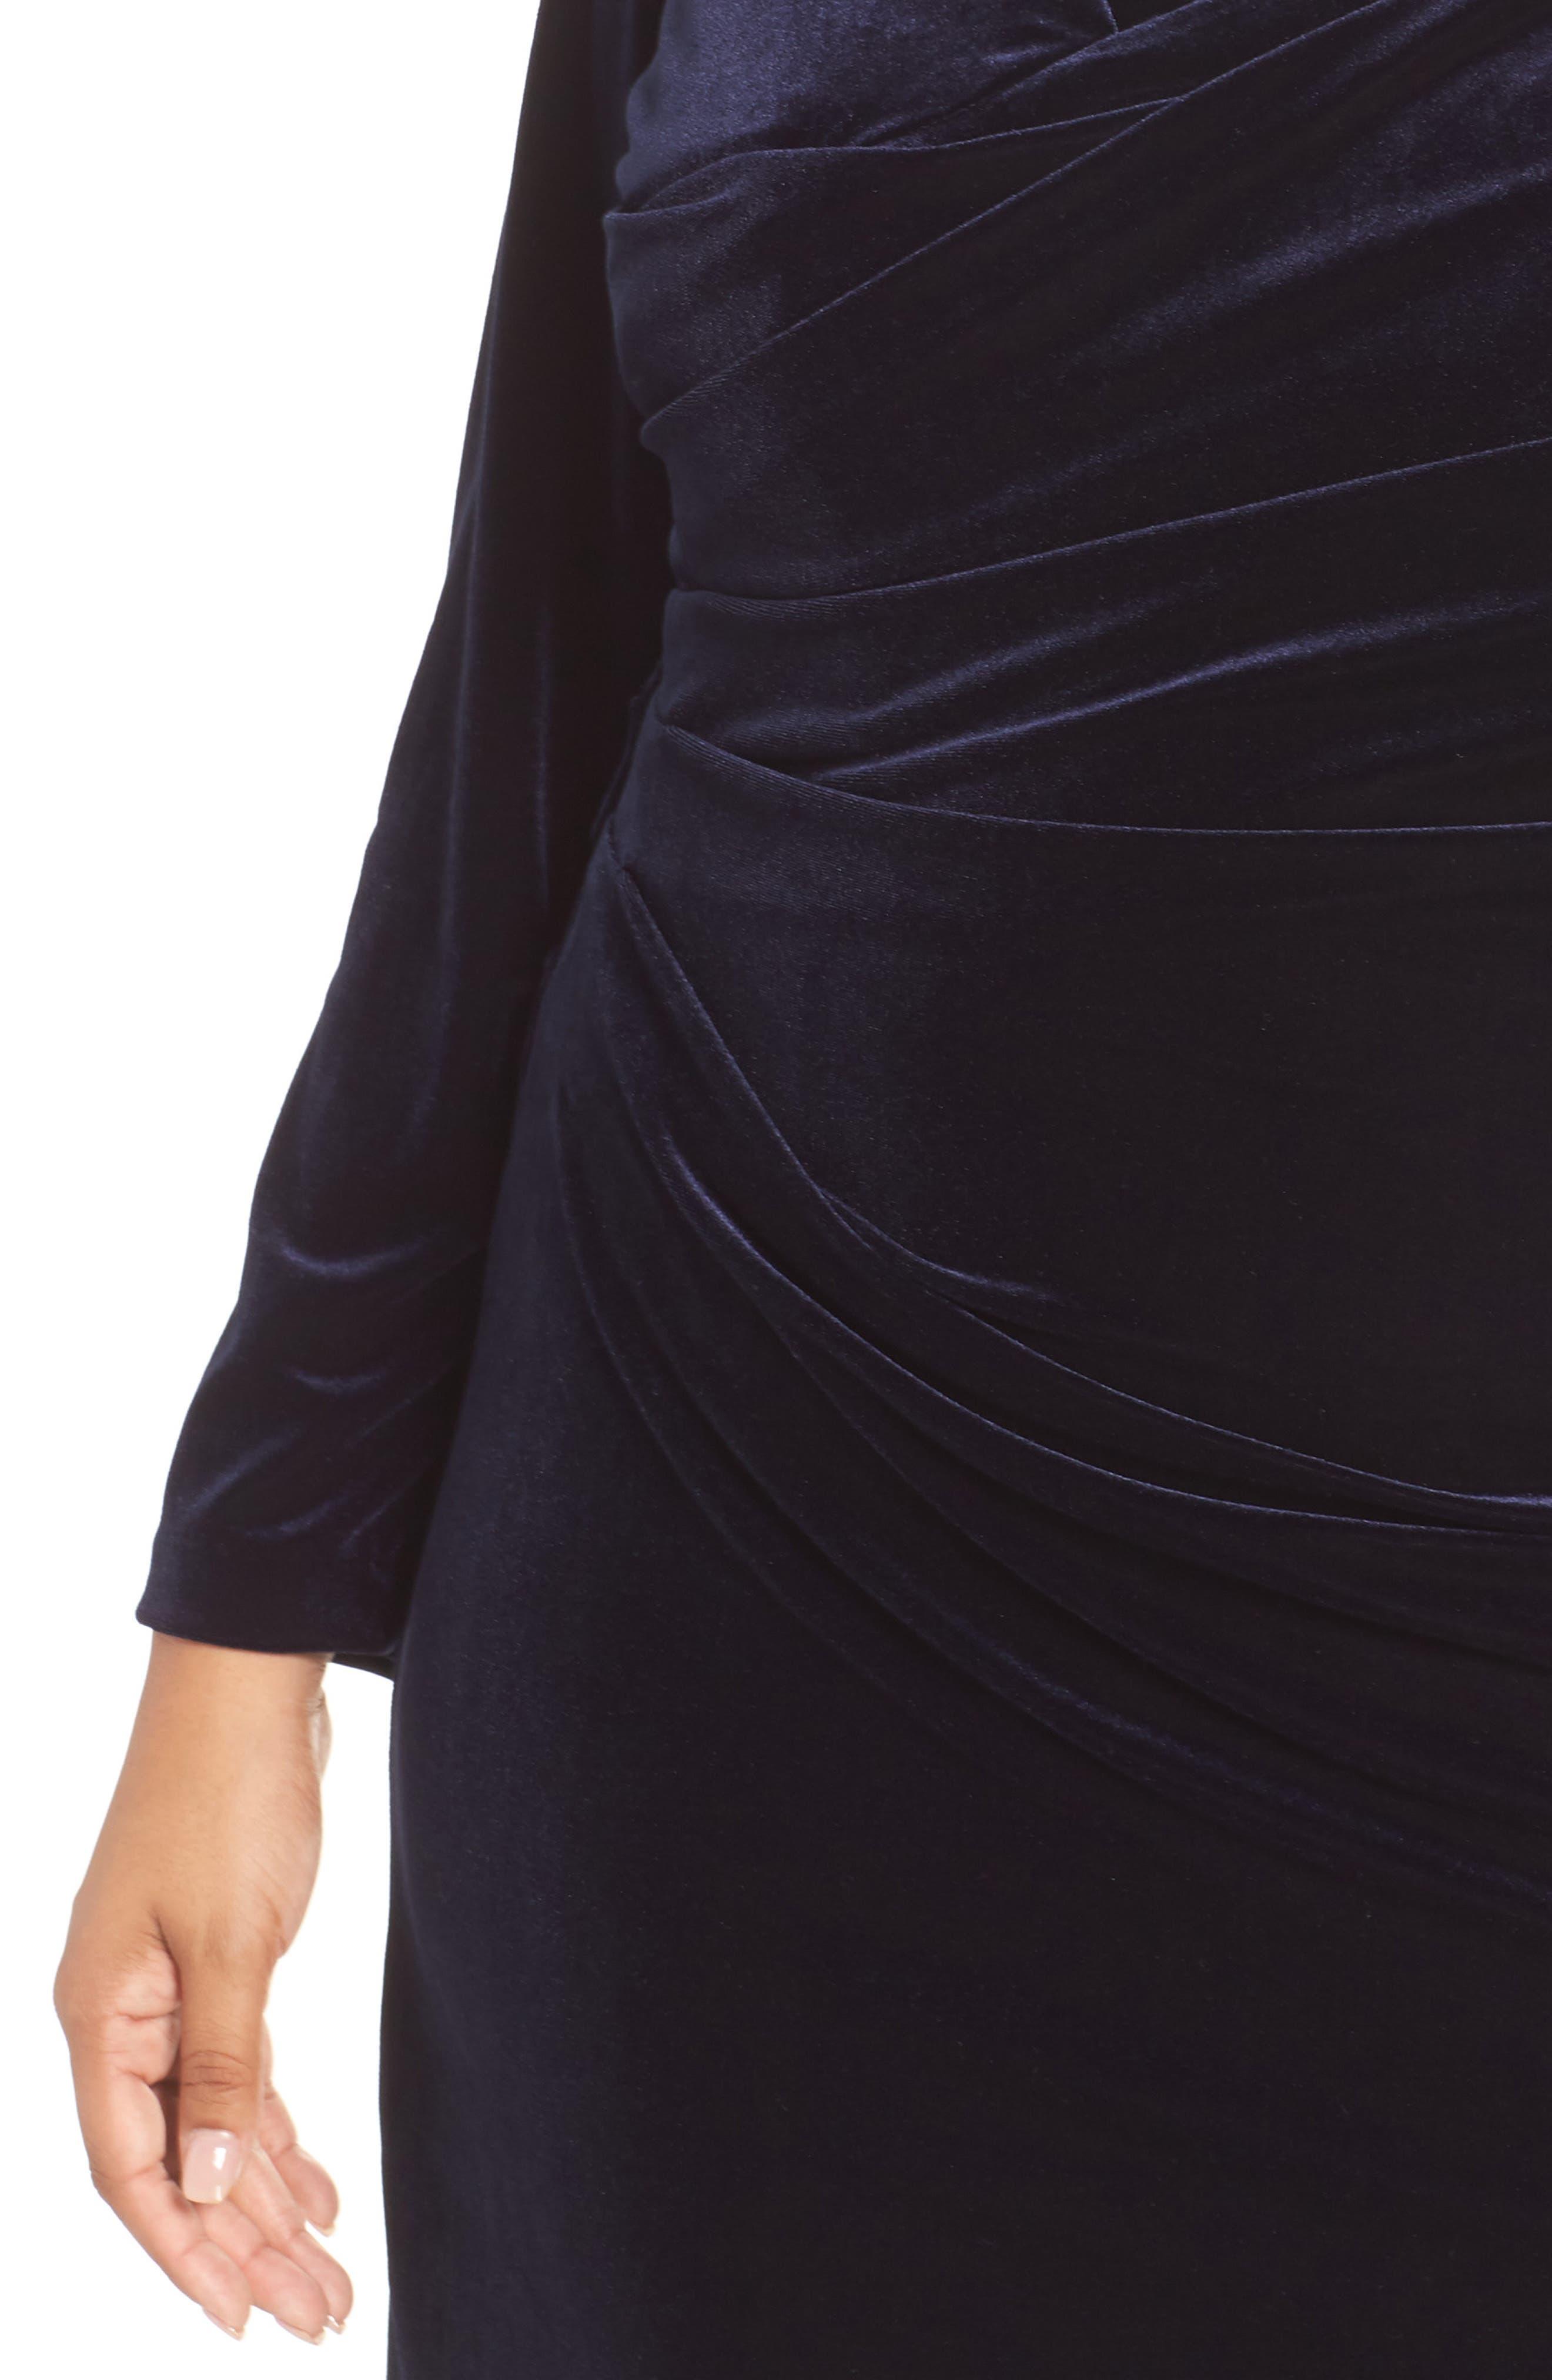 VINCE CAMUTO, Midi Dress, Alternate thumbnail 5, color, 410